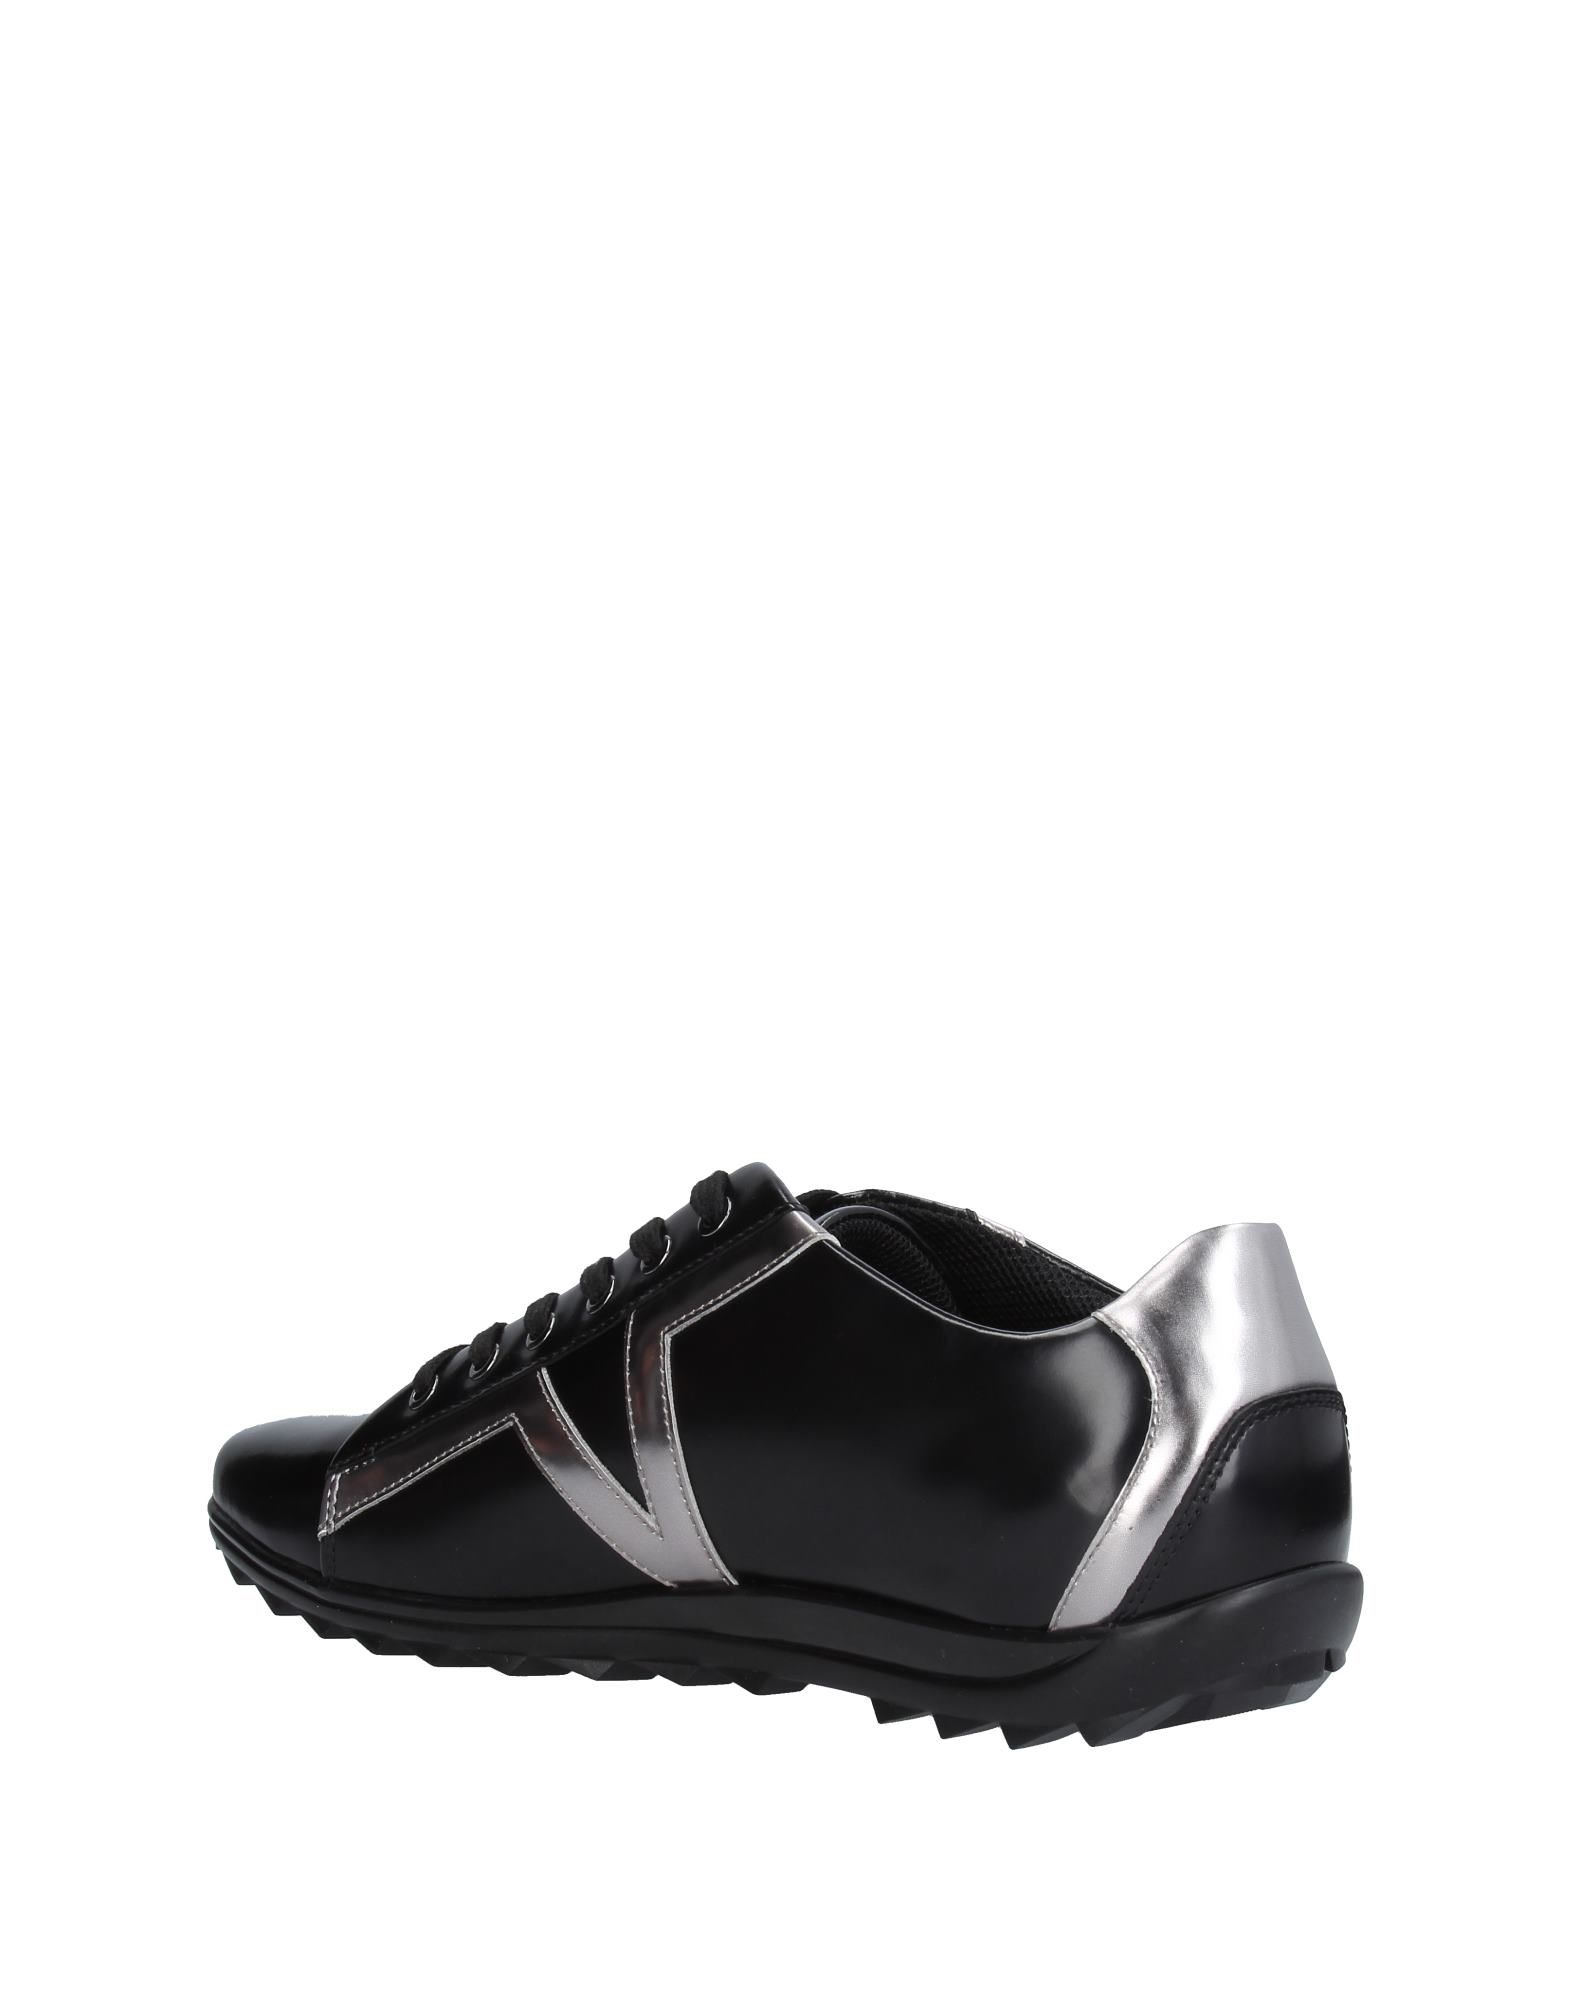 Versace Collection Sneakers Herren  11227767DV 11227767DV  Gute Qualität beliebte Schuhe 50dcbf